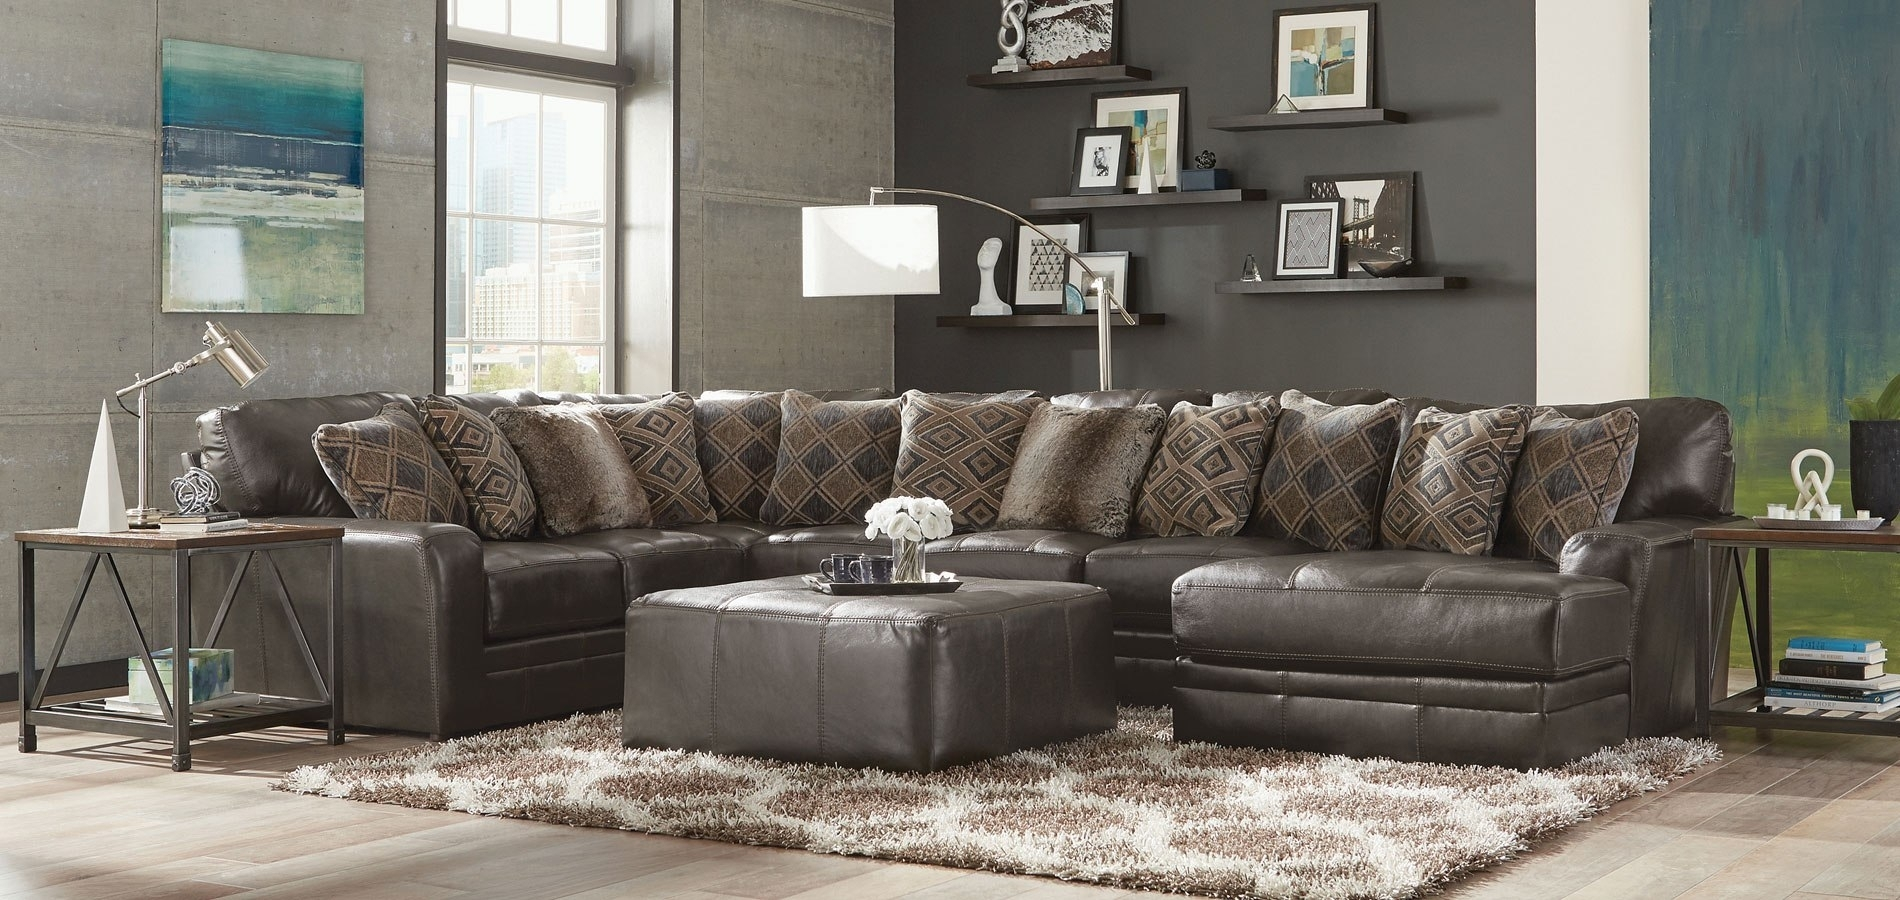 Denali Modular Sectional (Steel) Jackson Furniture | Furniture Cart In Jackson 6 Piece Power Reclining Sectionals (Image 10 of 25)